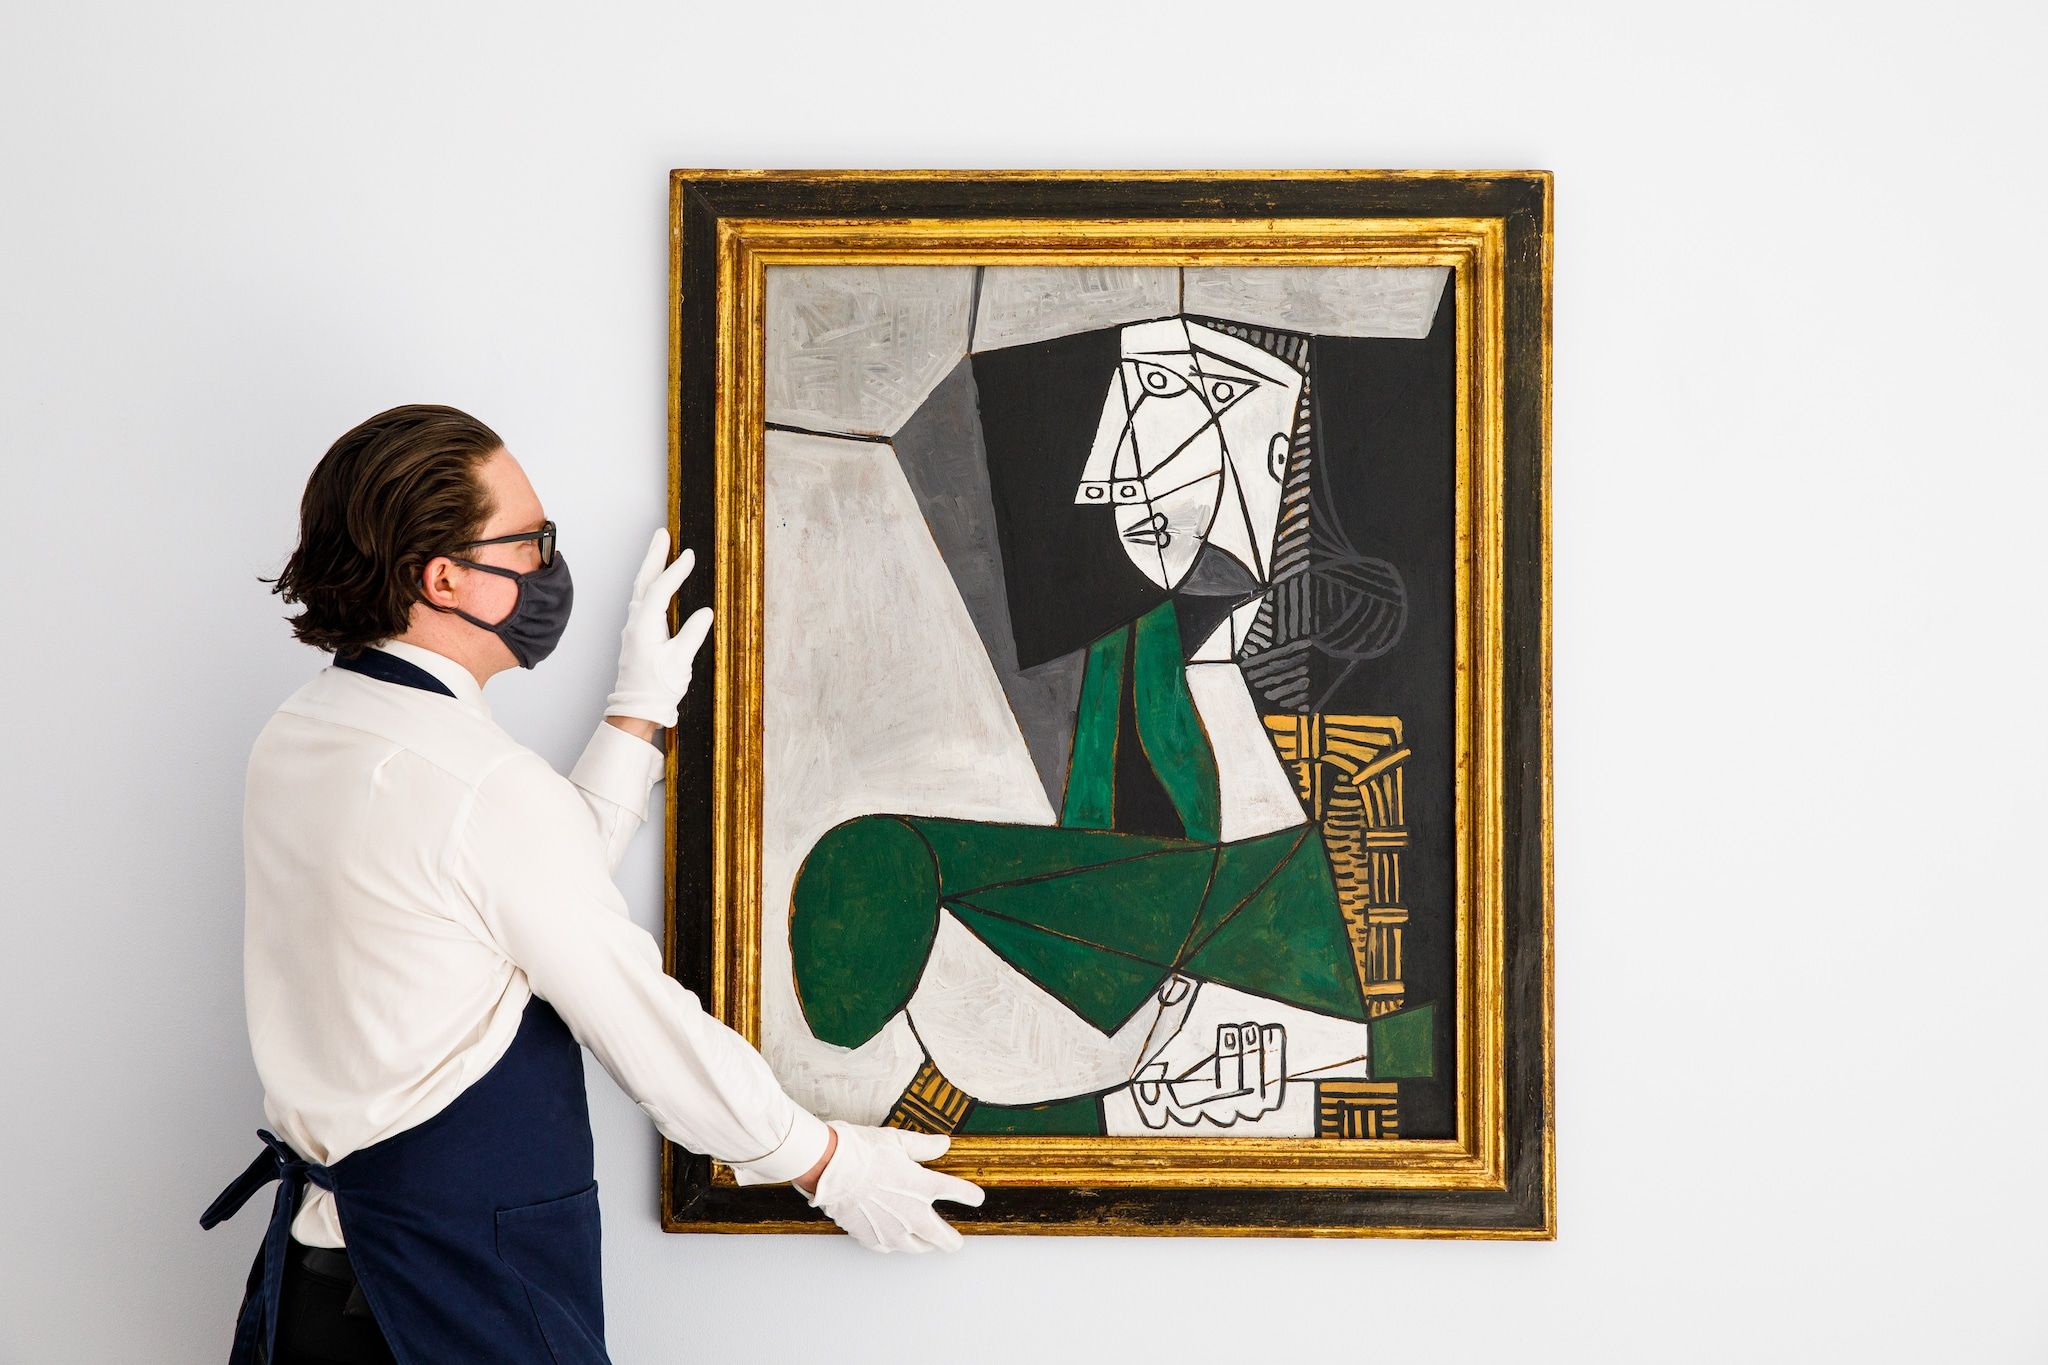 Pablo Picasso, Femme assise en costume vert, stima 14-18 milioni di dollari Courtesy Sotheby's